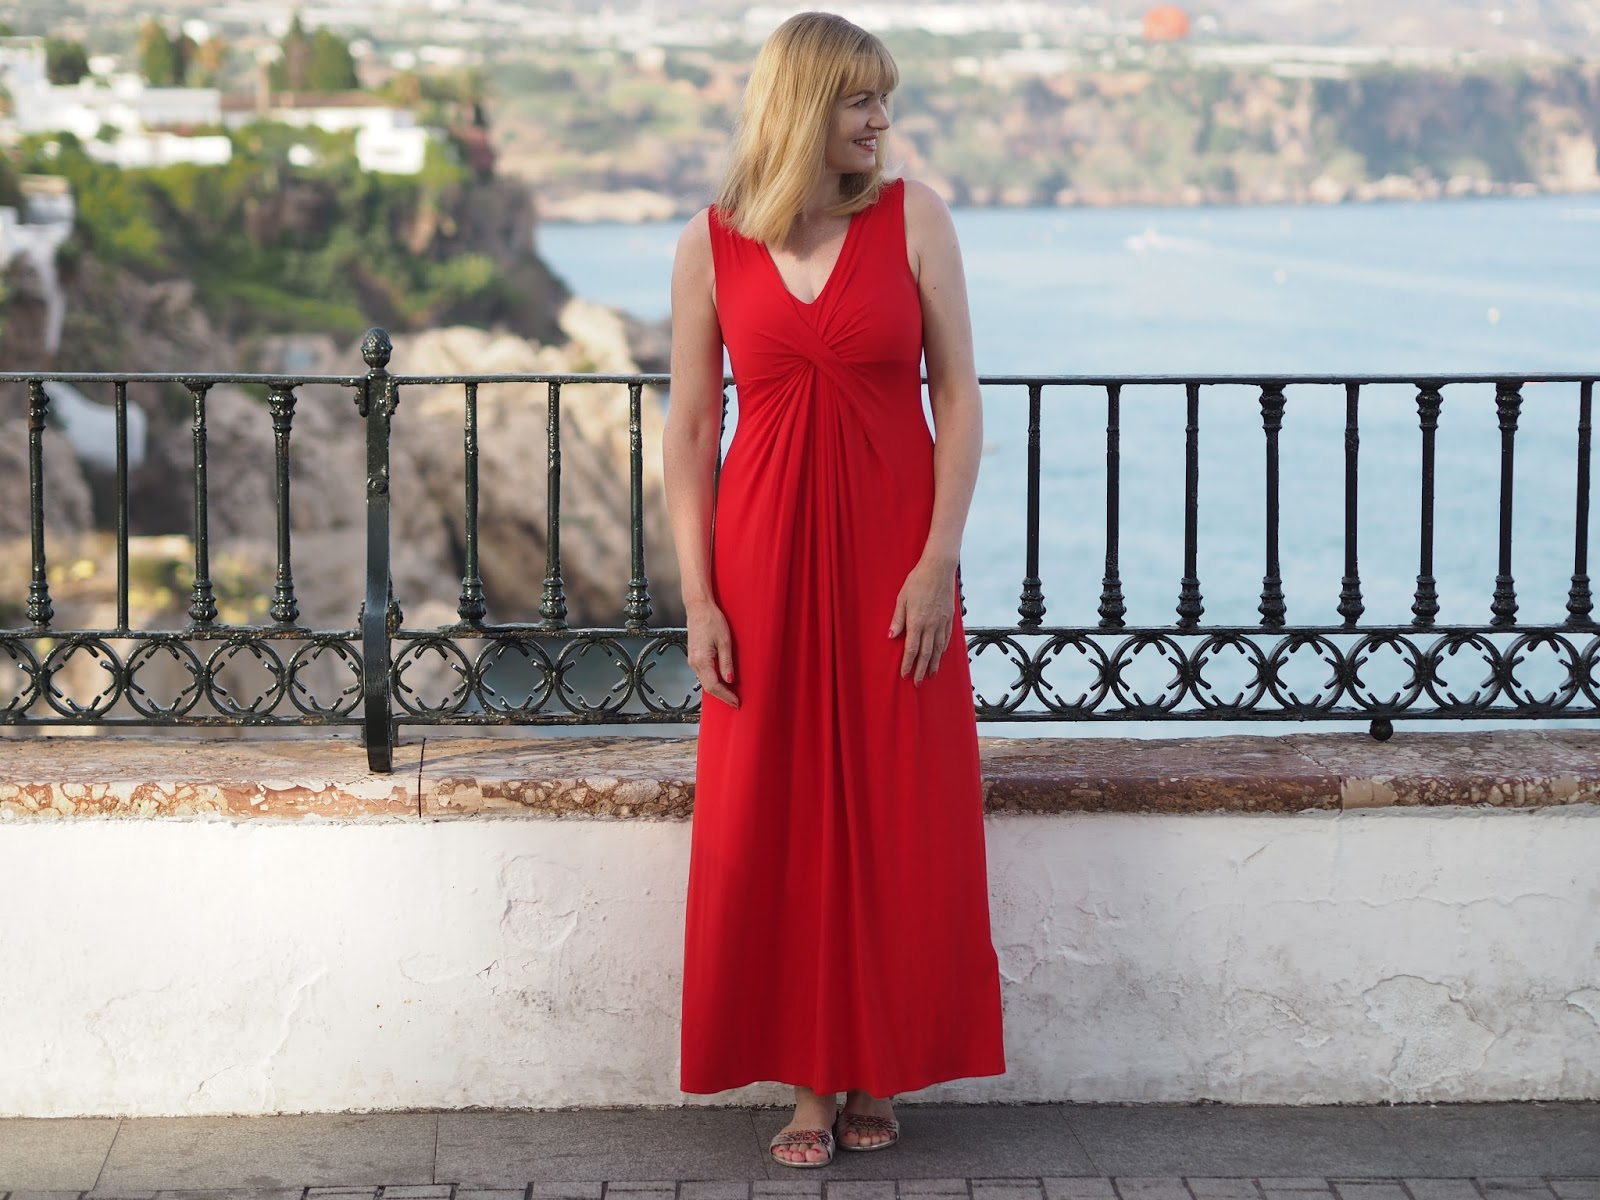 Accessorising a red maxi dress